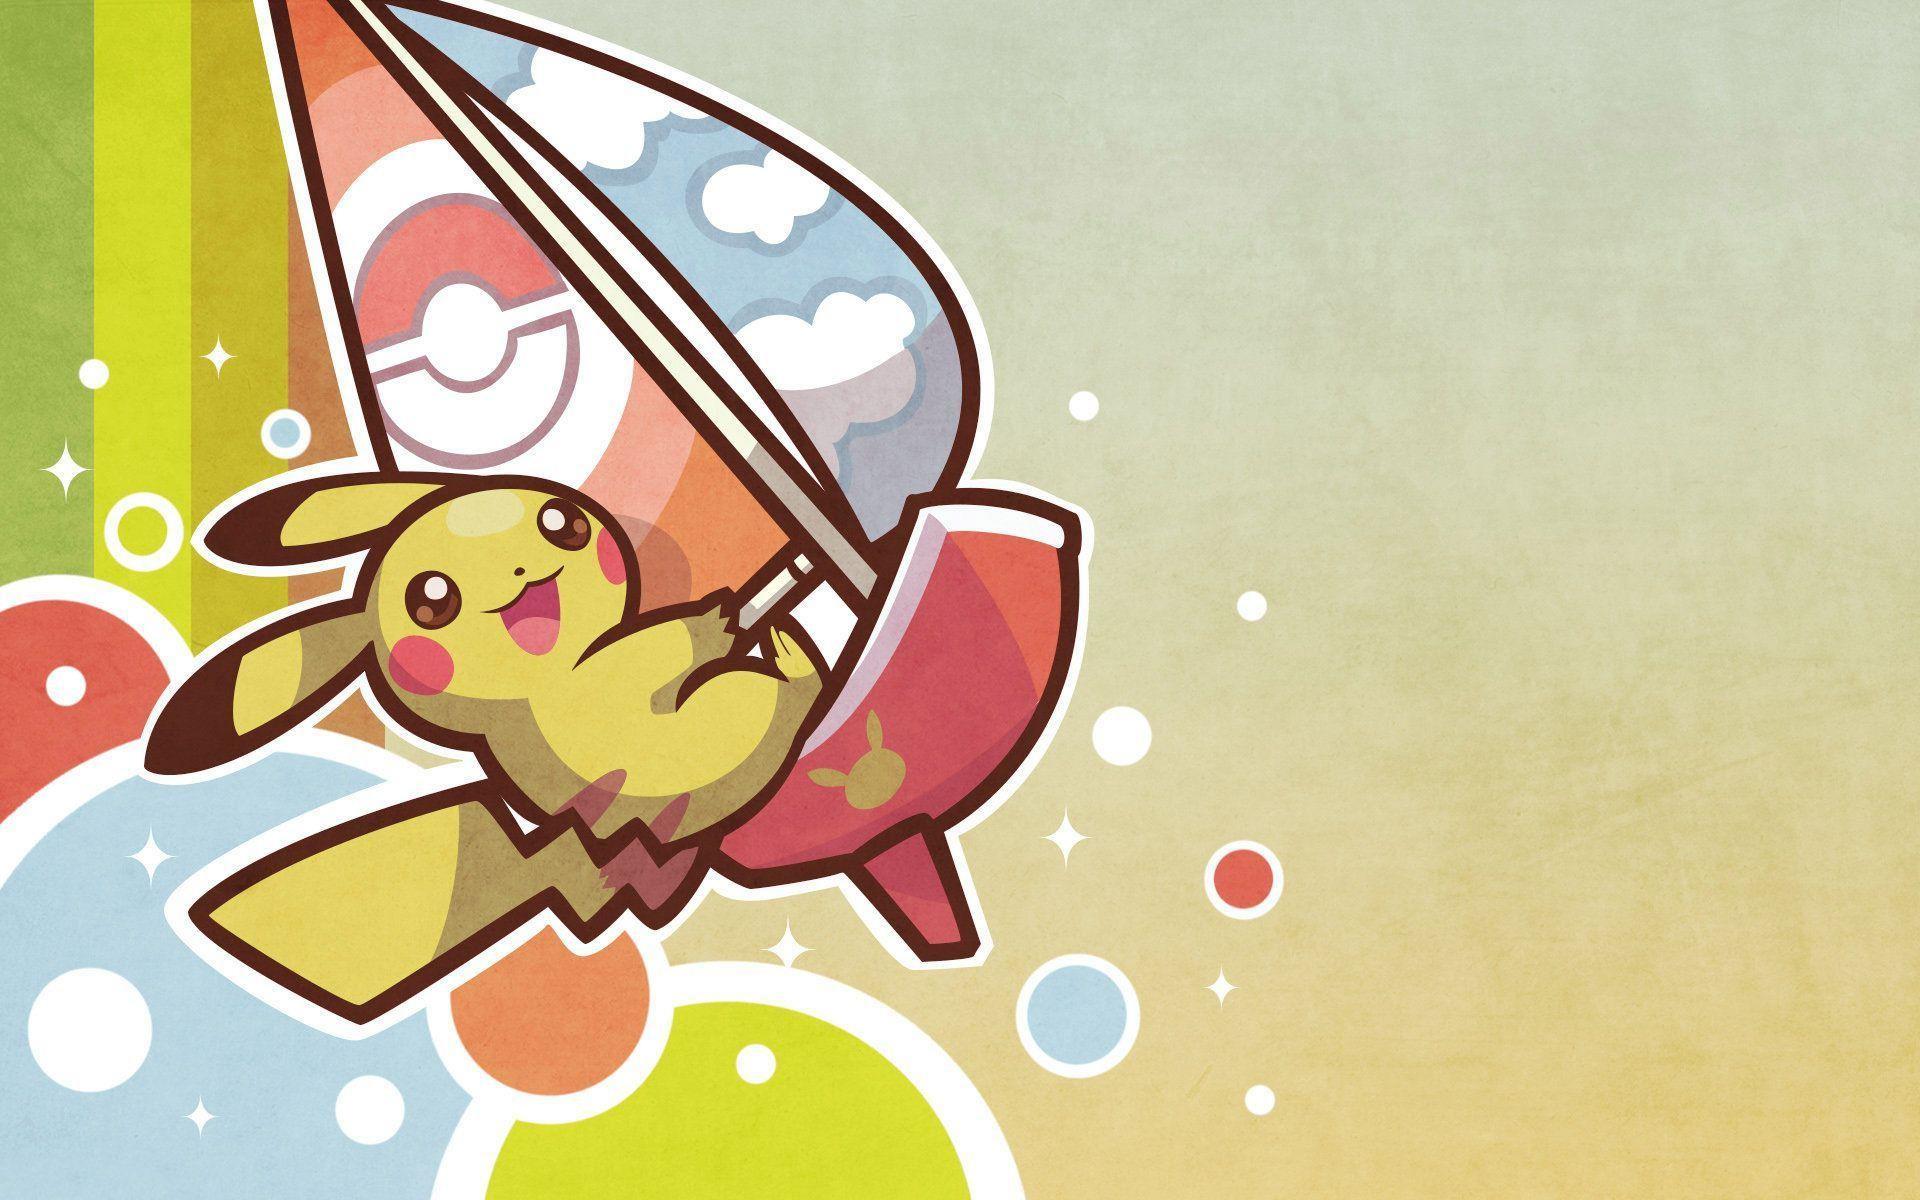 Pokemon Pikachu Wallpaper Background for